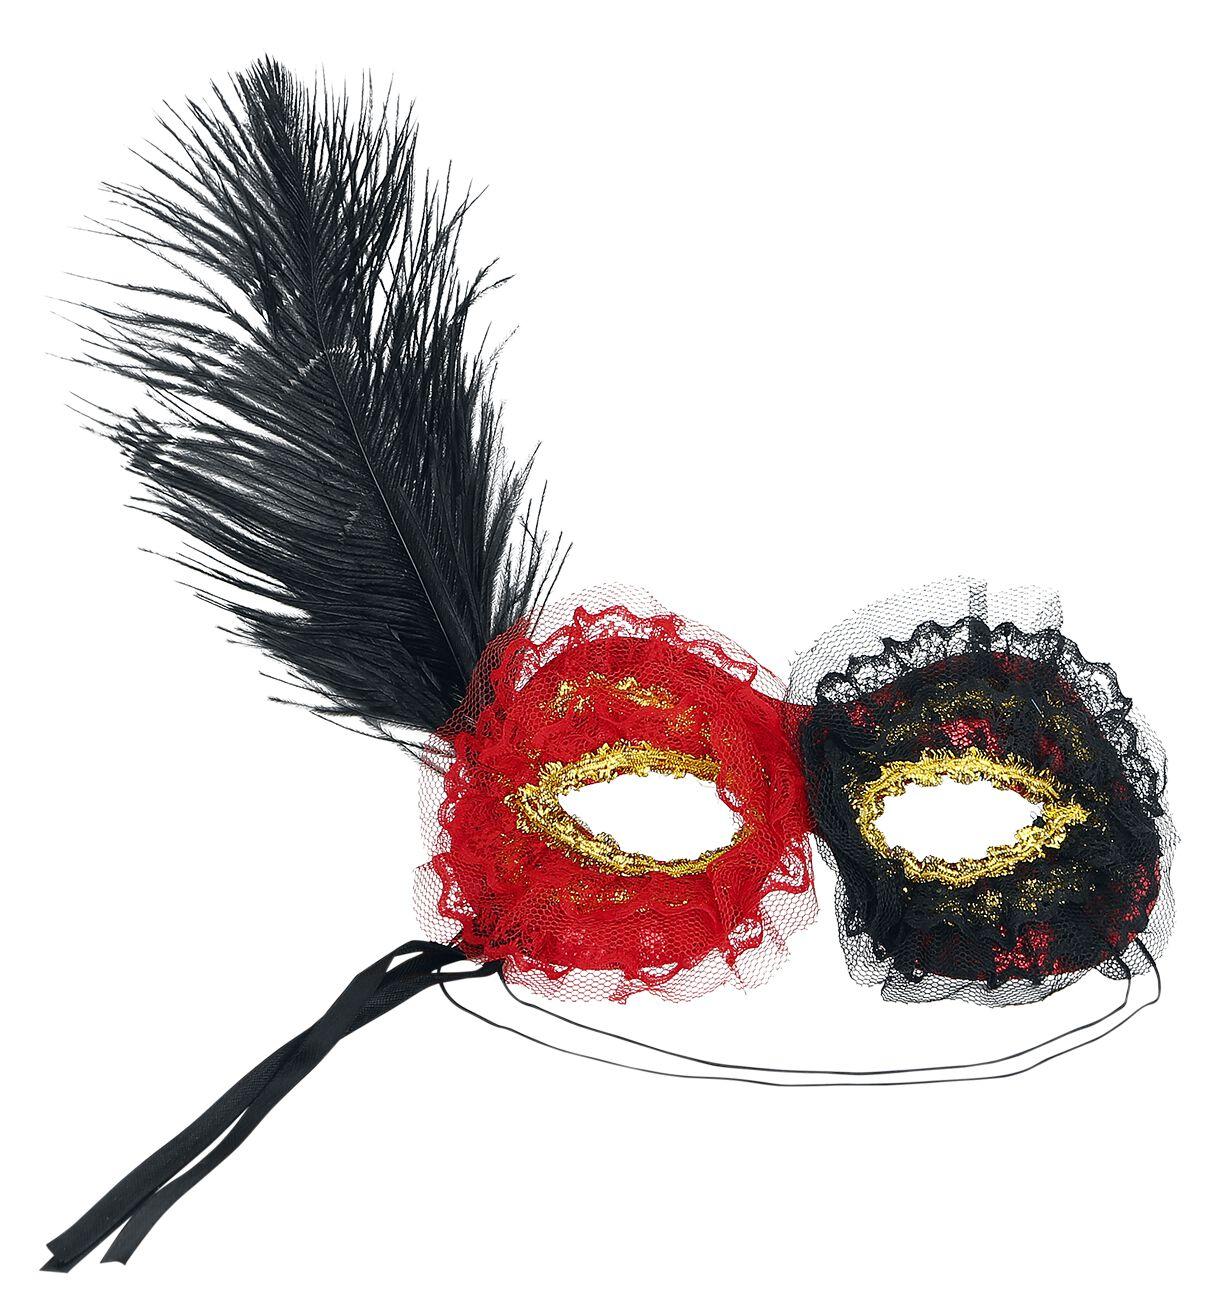 Basics - Maski i Kostiumy - Maska Dark Hours Mask Black And Red Maska standard - 366585